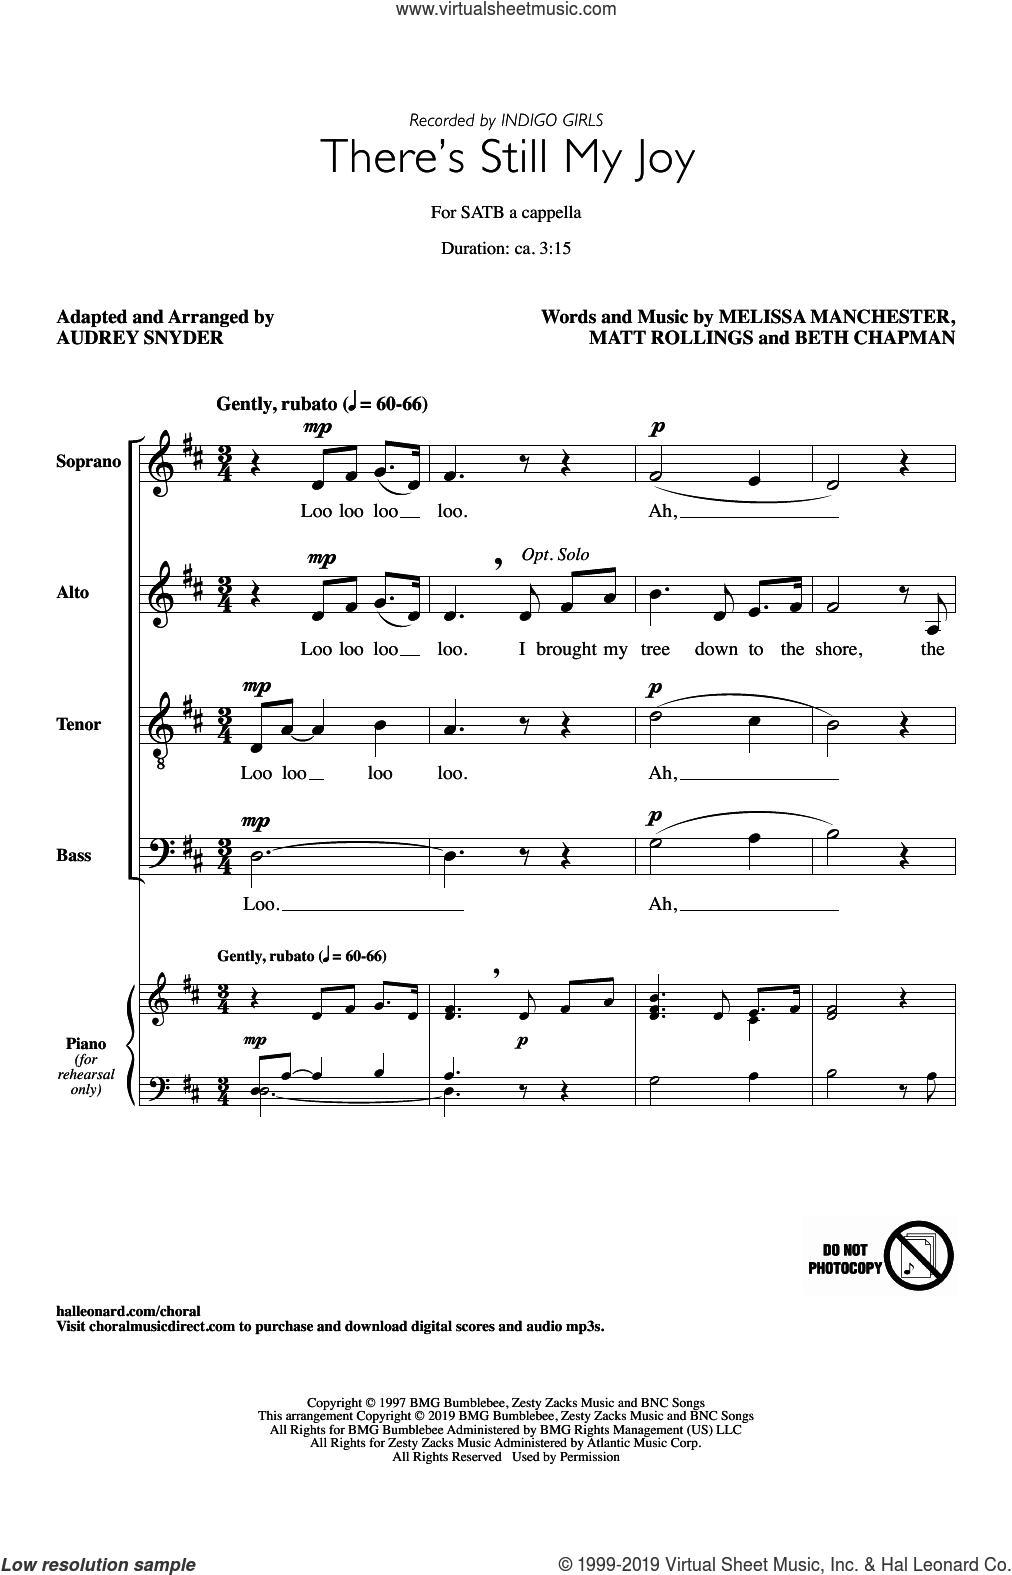 There's Still My Joy (arr. Audrey Snyder) sheet music for choir (SATB: soprano, alto, tenor, bass) by Indigo Girls, Audrey Snyder, Beth Chapman, Matt Rollings and Melissa Manchester, intermediate skill level